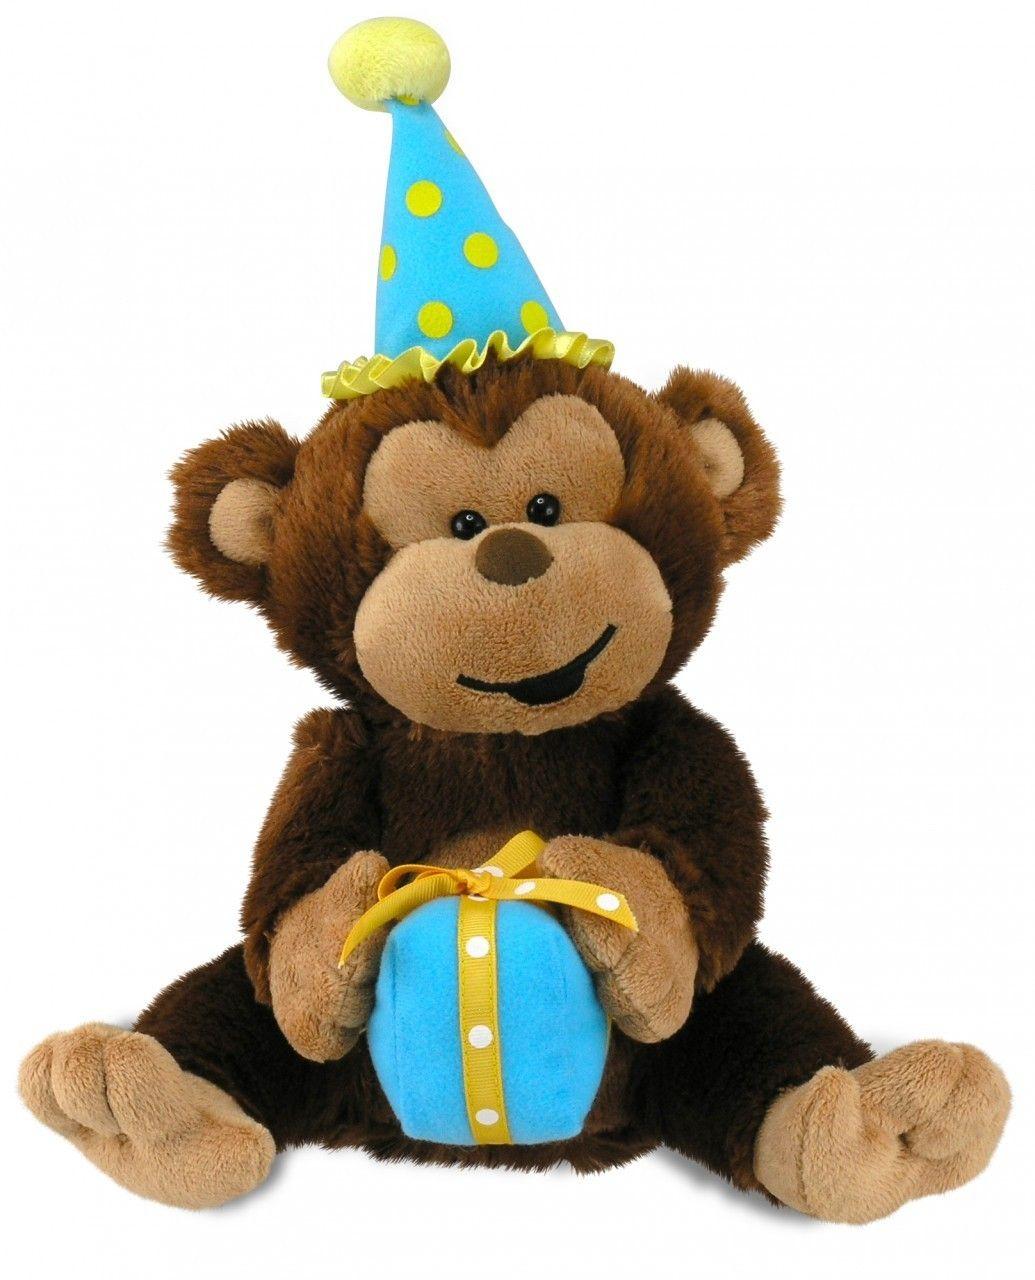 Cuddle Barn 11 Singing Plush Stuffed Animal Bingo My Name-O Flaps His Ears and Claps Hands